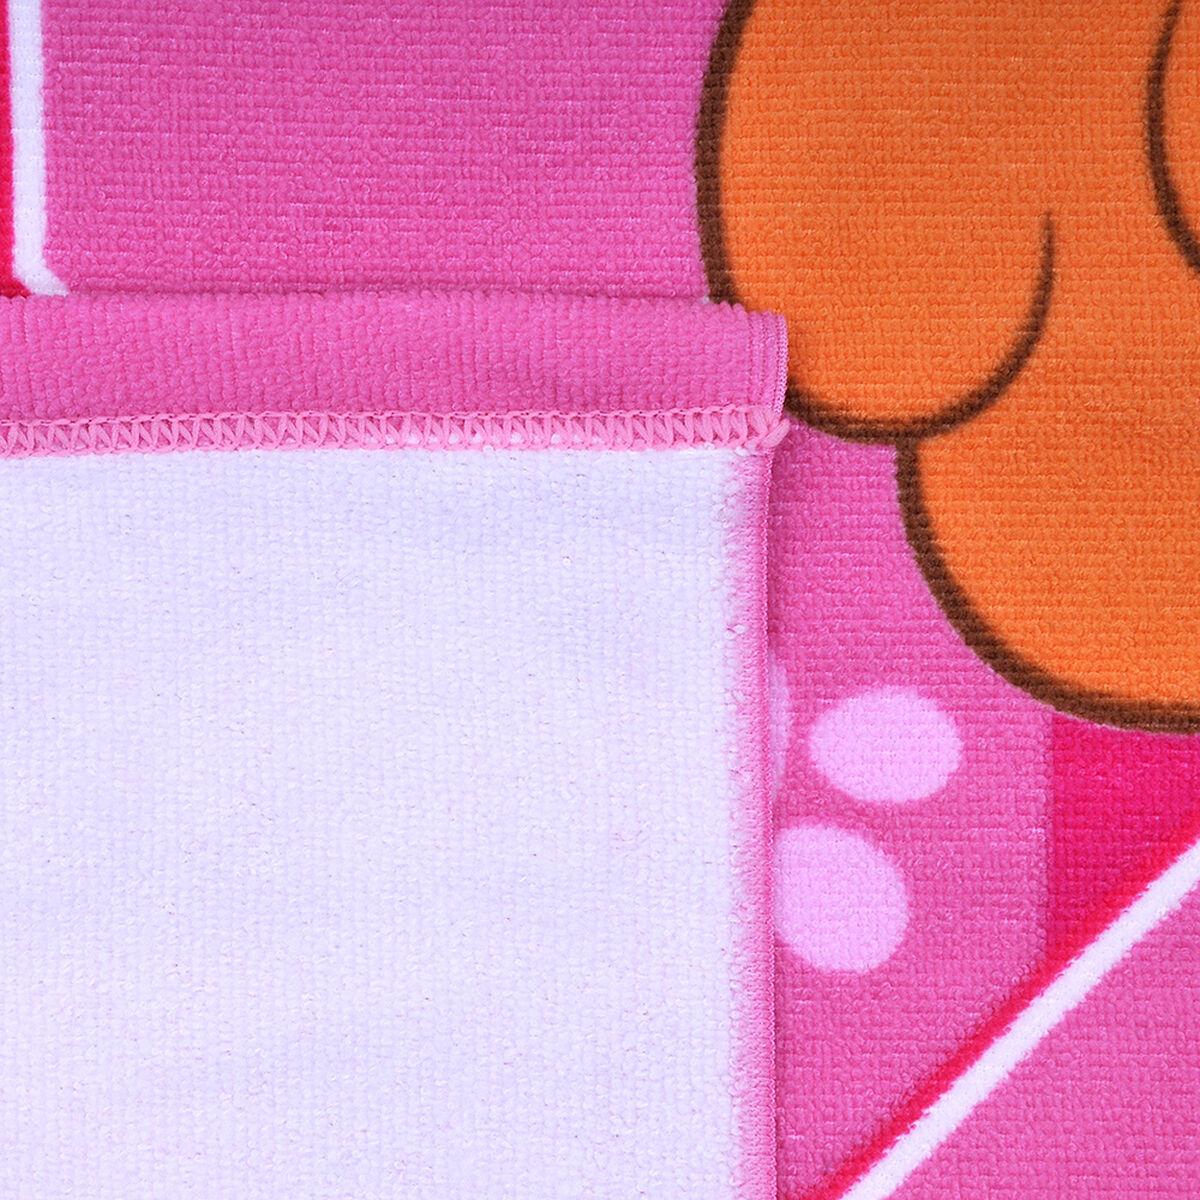 Toalla de Playa Disney Paw Patroll Niña Pinky 60 x 120 cm